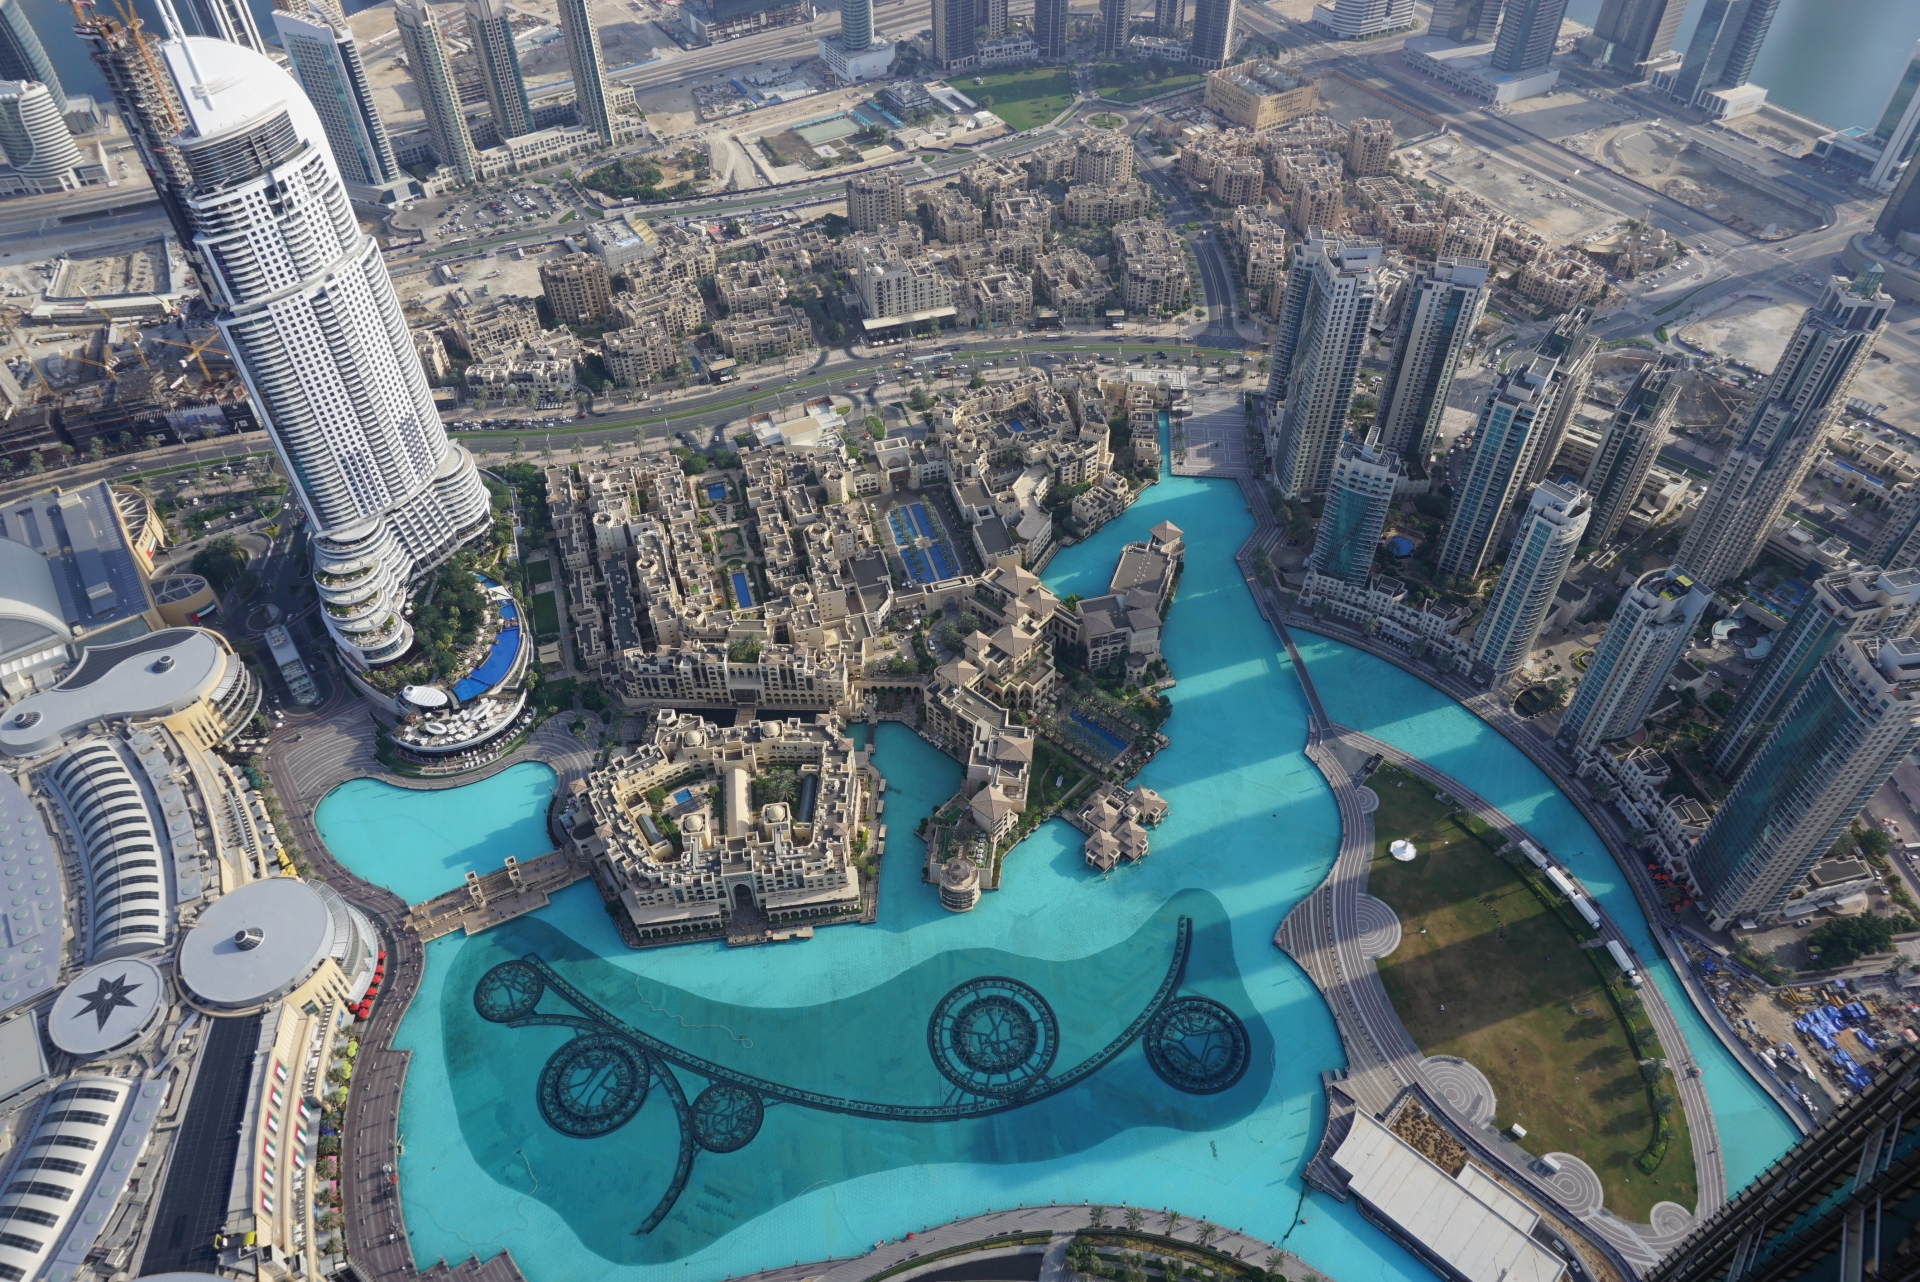 Transit tour with Burj Khalifa's ticket